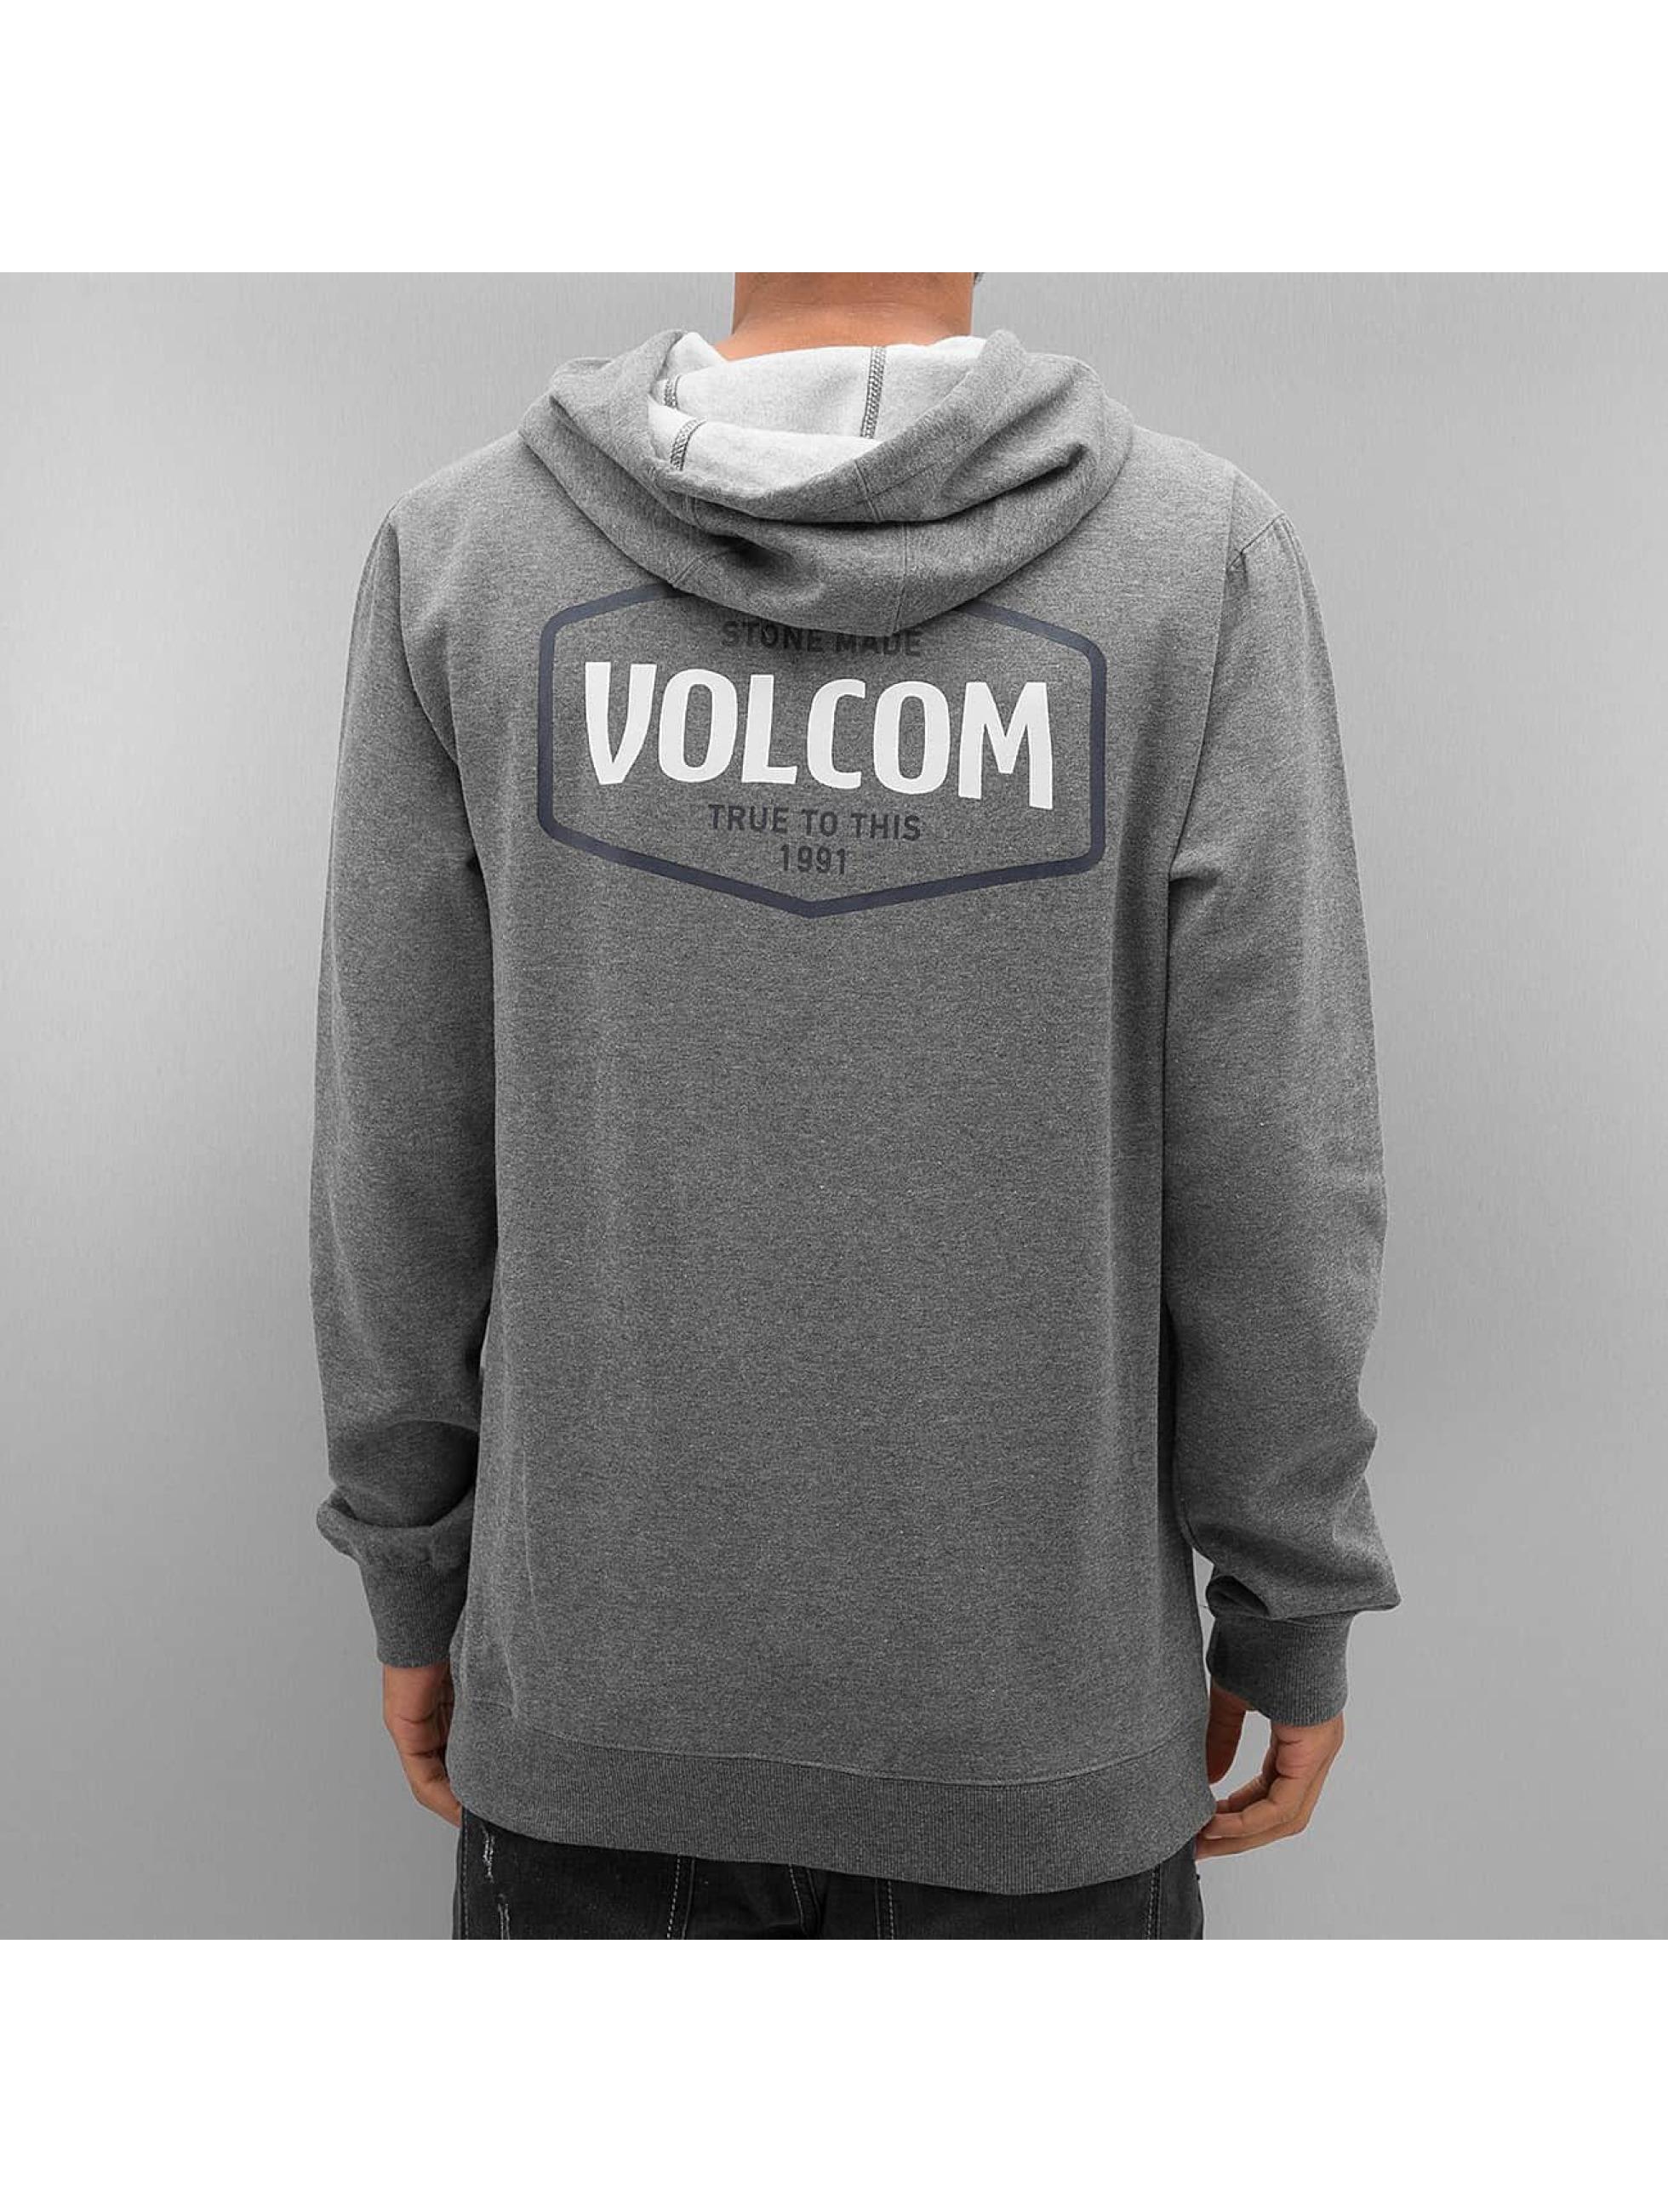 Volcom Felpa con cappuccio Packsaddle grigio